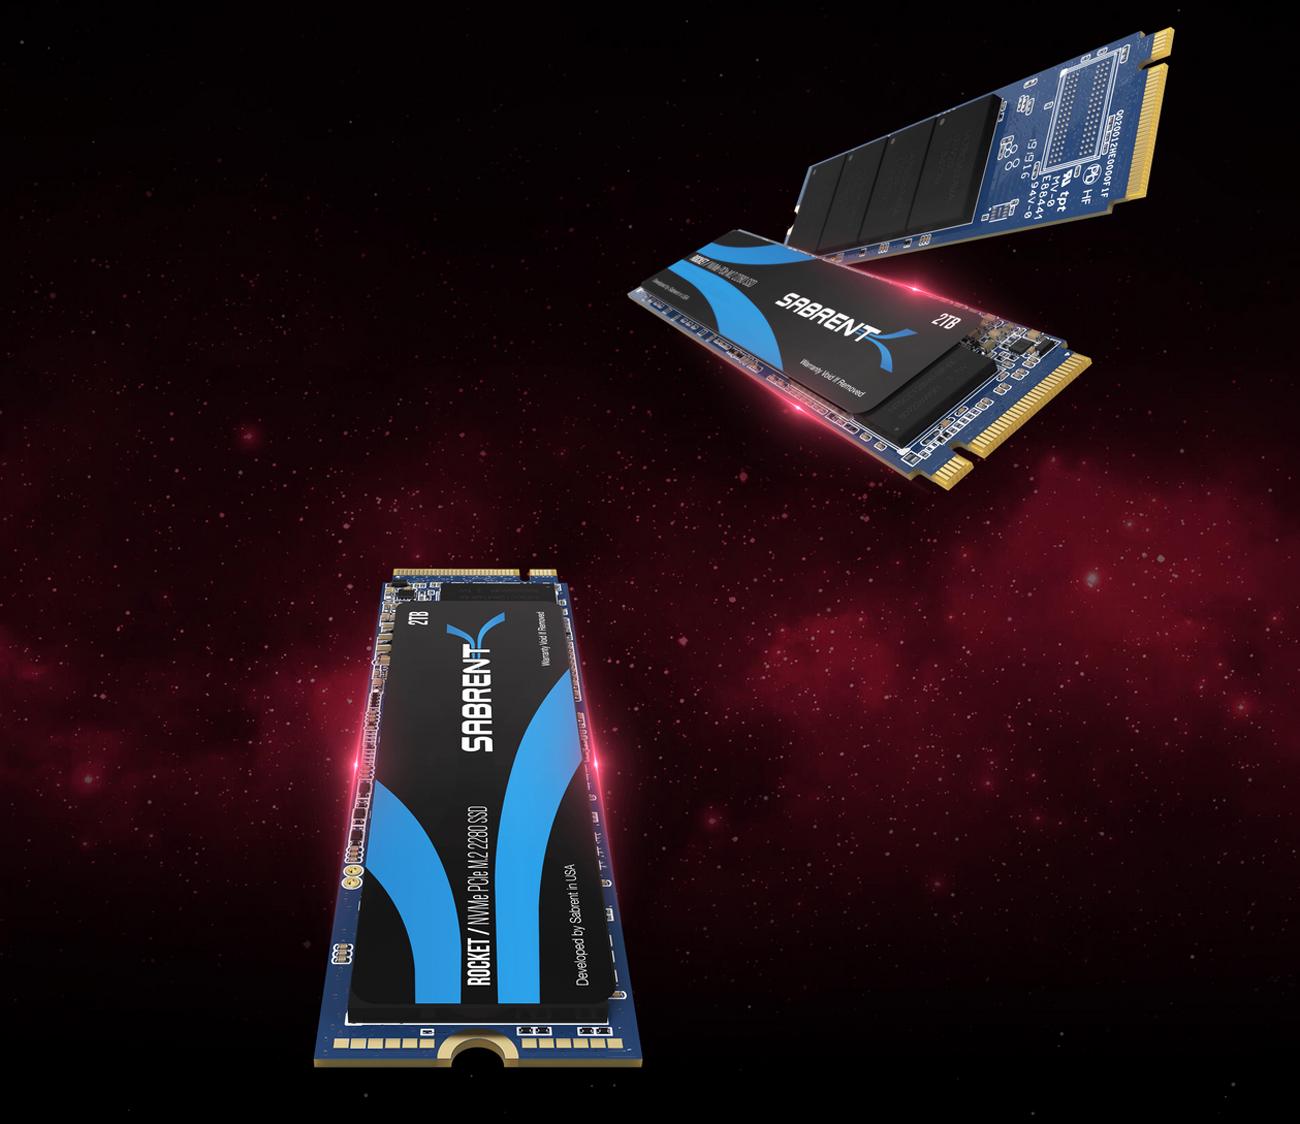 SB-ROCKET-1TB Sabrent 1TB Rocket NVMe PCIe M.2 2280 Internal SSD High Performance Solid State Drive